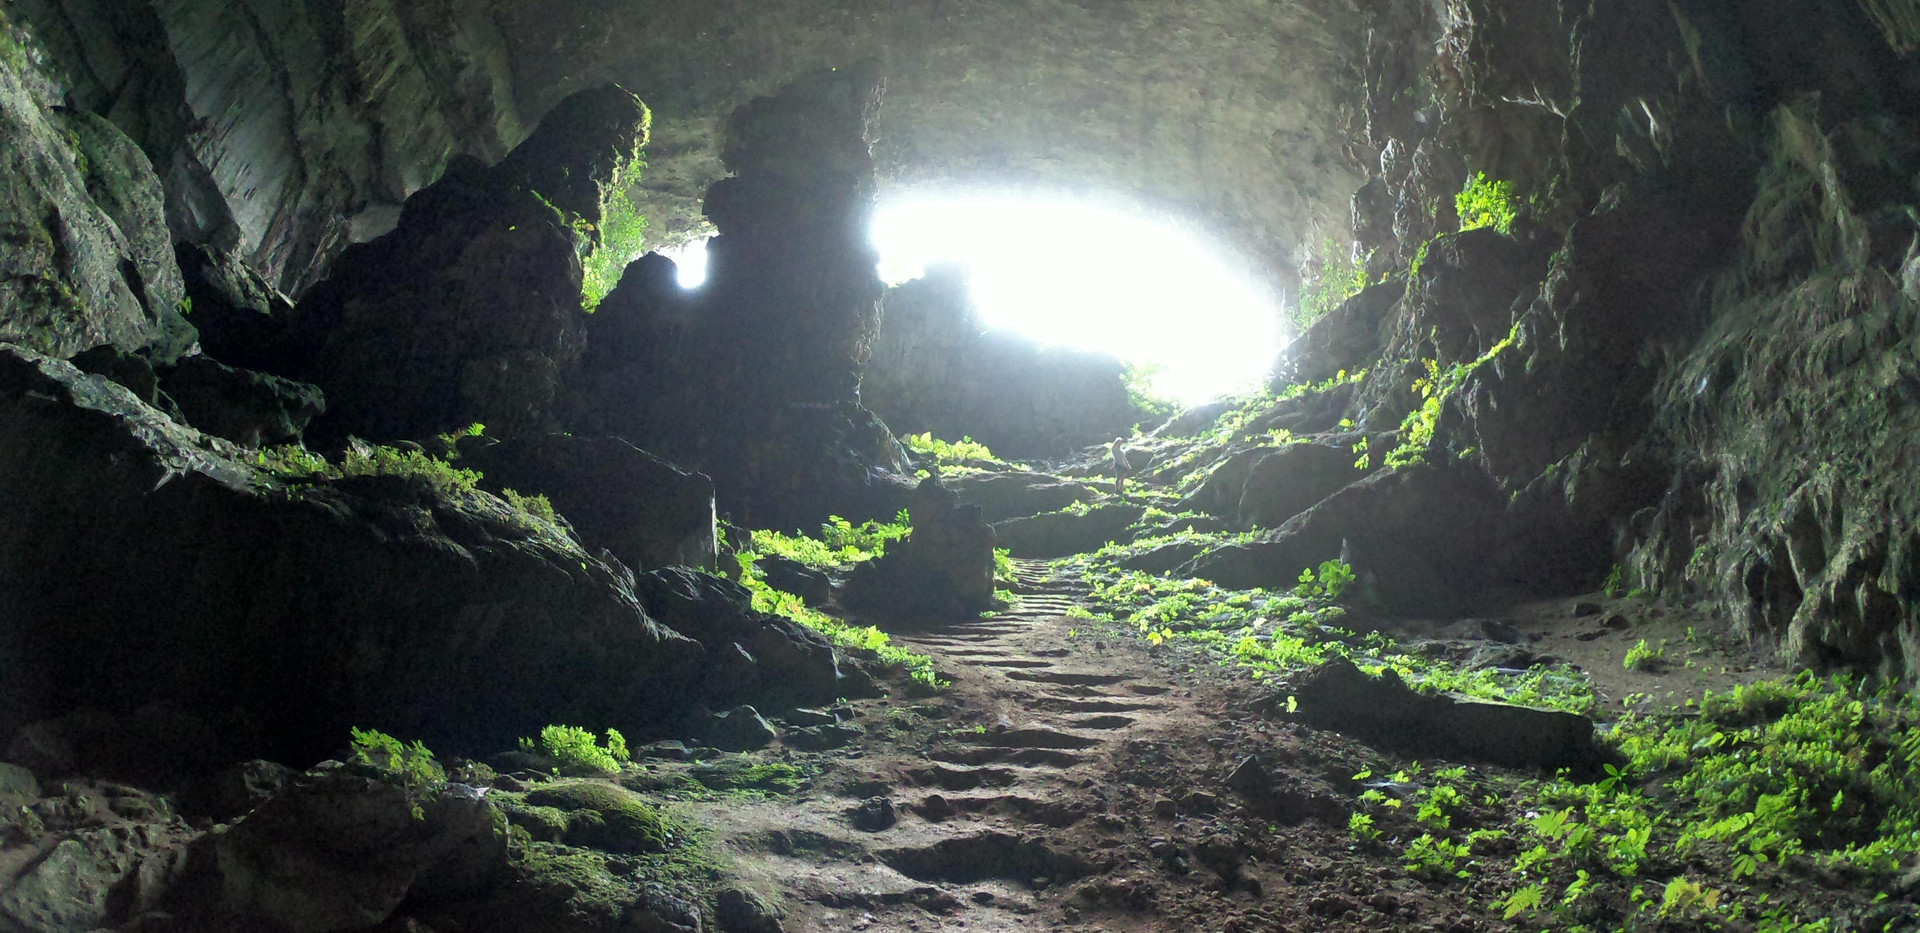 Dơi Cave